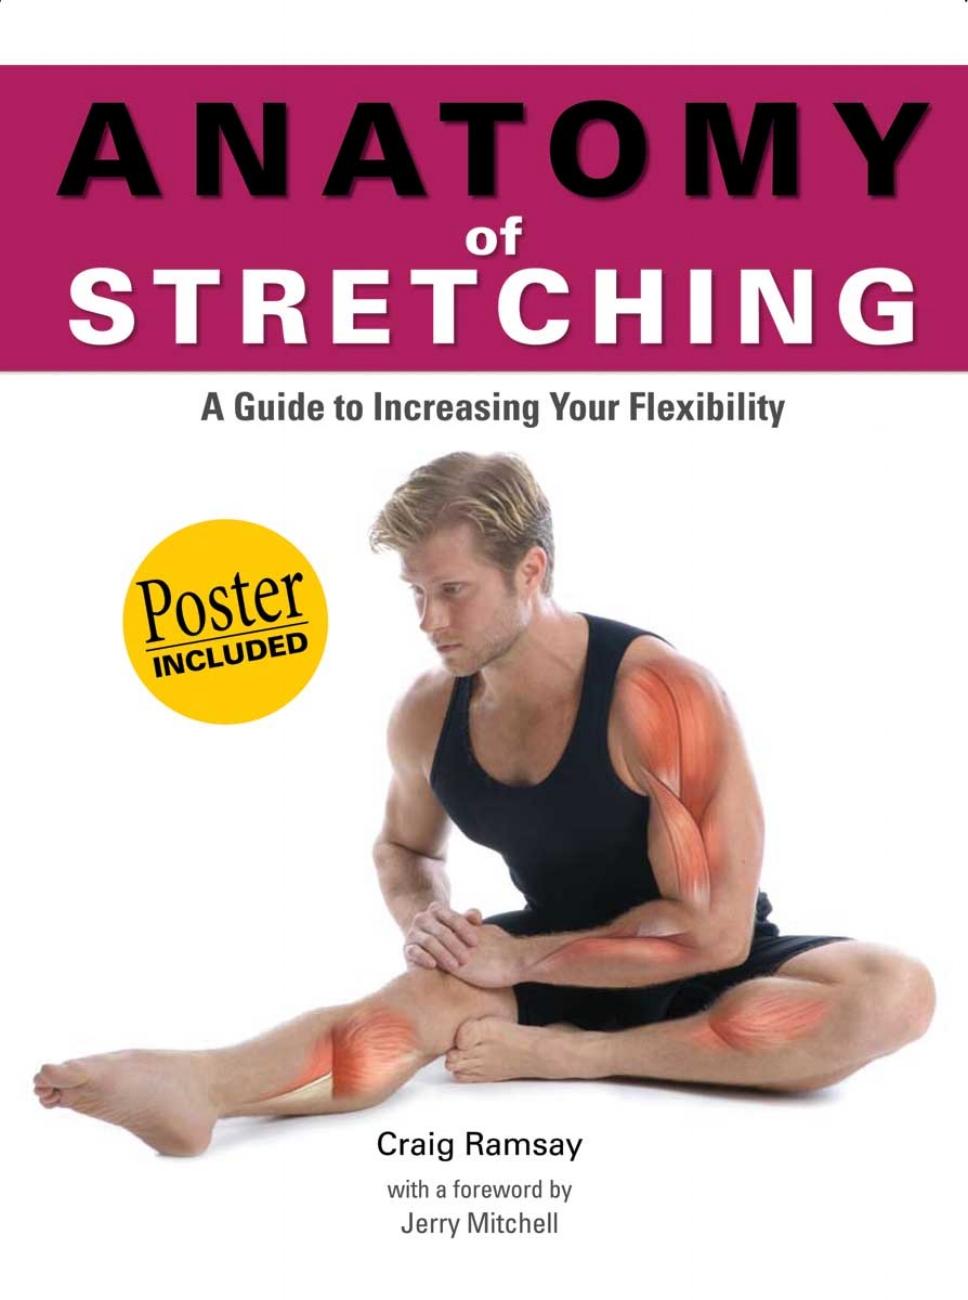 Craig Ramsay Anatomy of Stretching Book Cover.jpg